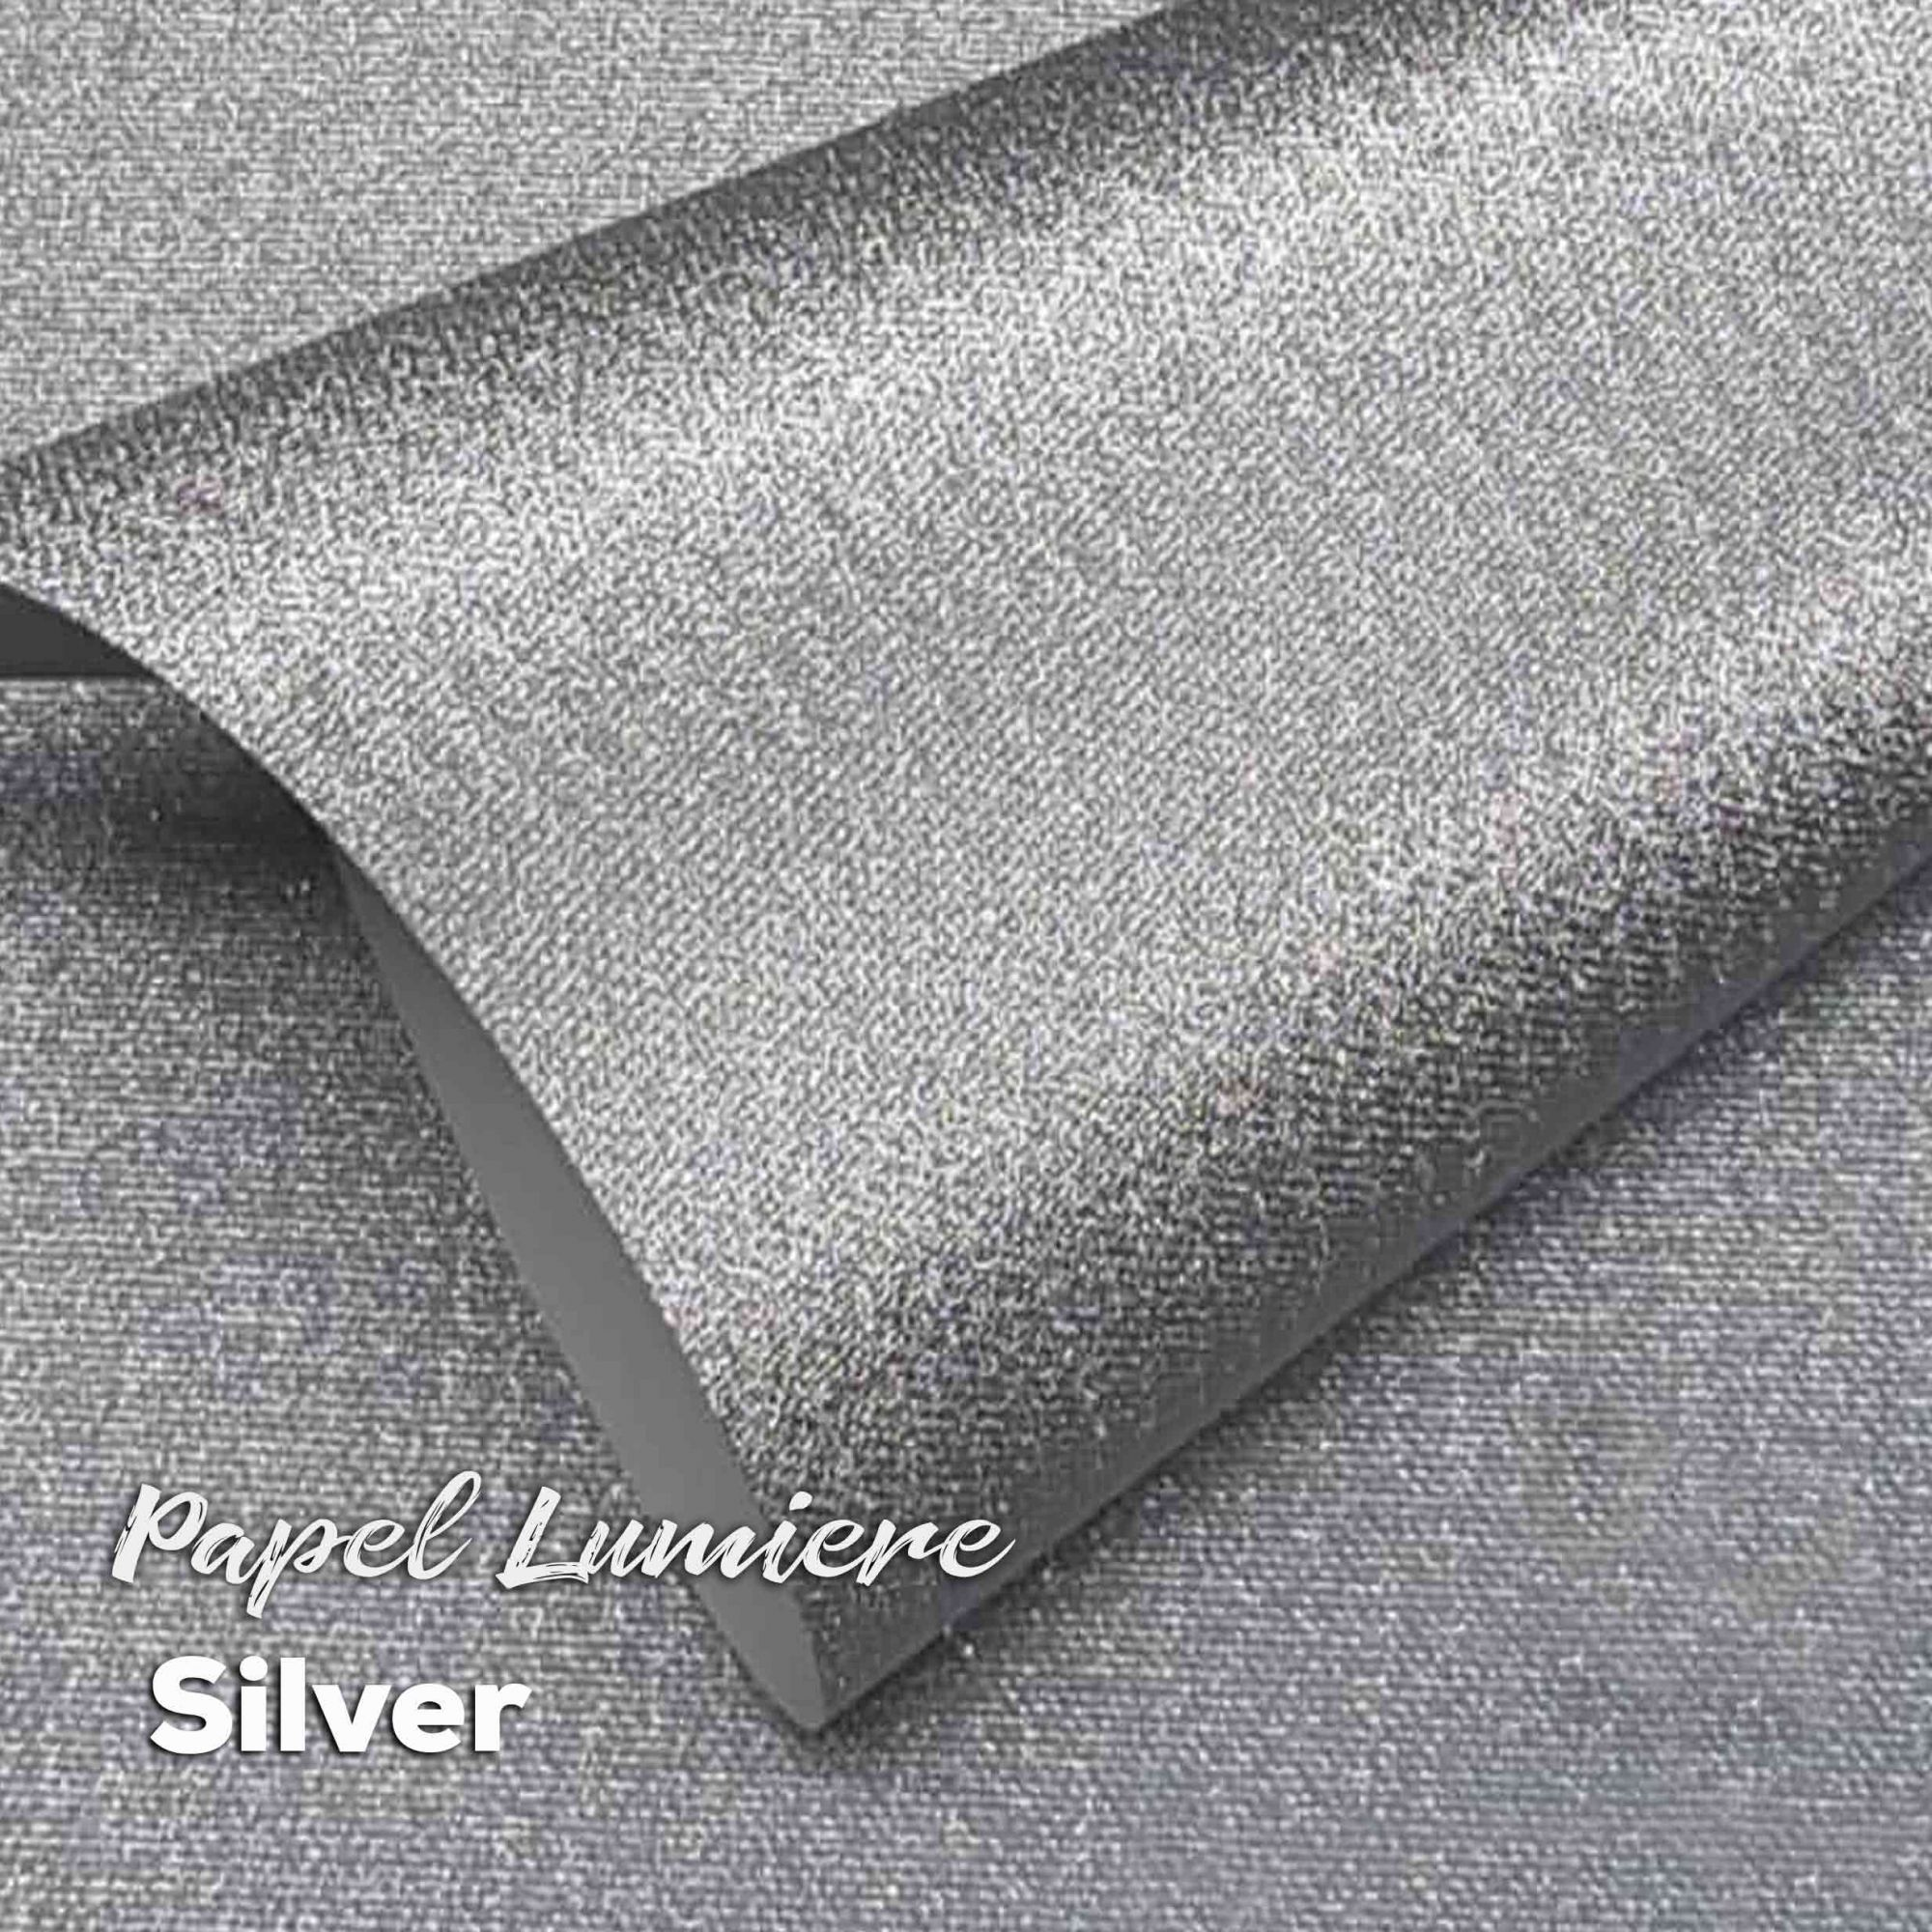 Papel Glitter Lumiere Silver 150g - Prata - A4 com 10 folhas